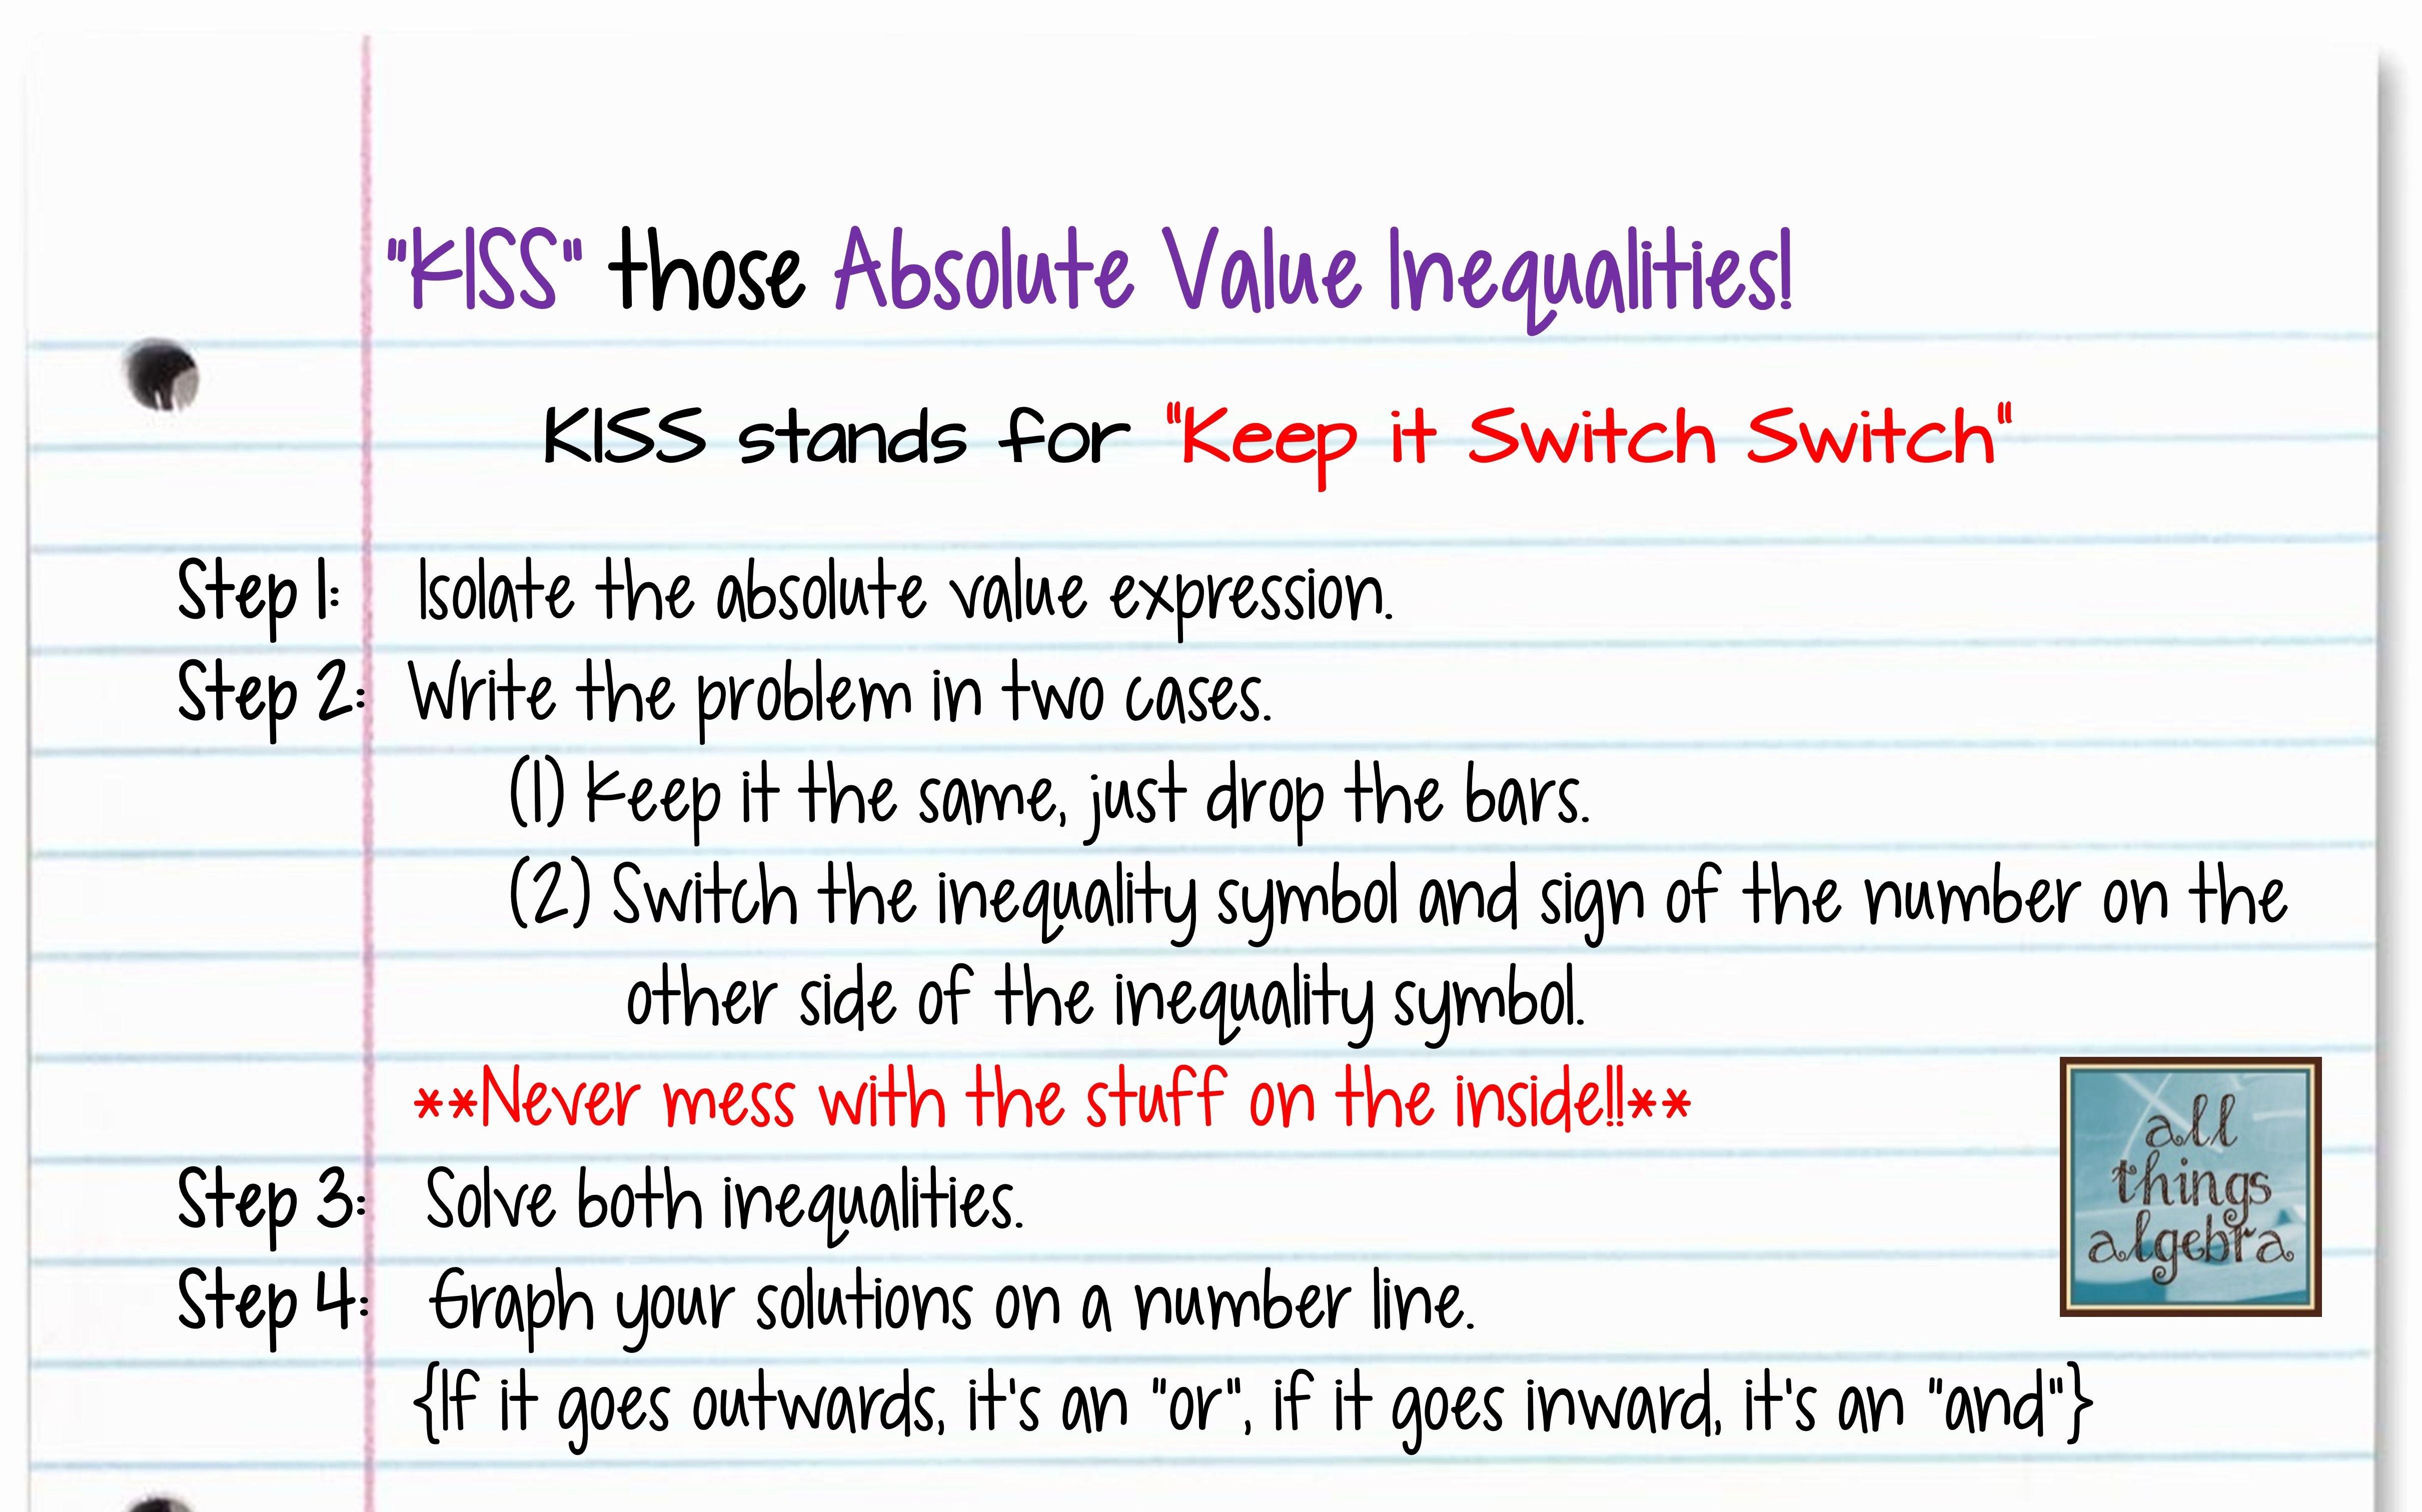 Solving Absolute Value Inequalities Worksheet Beautiful Kiss Method for solving Absolute Value Inequalities